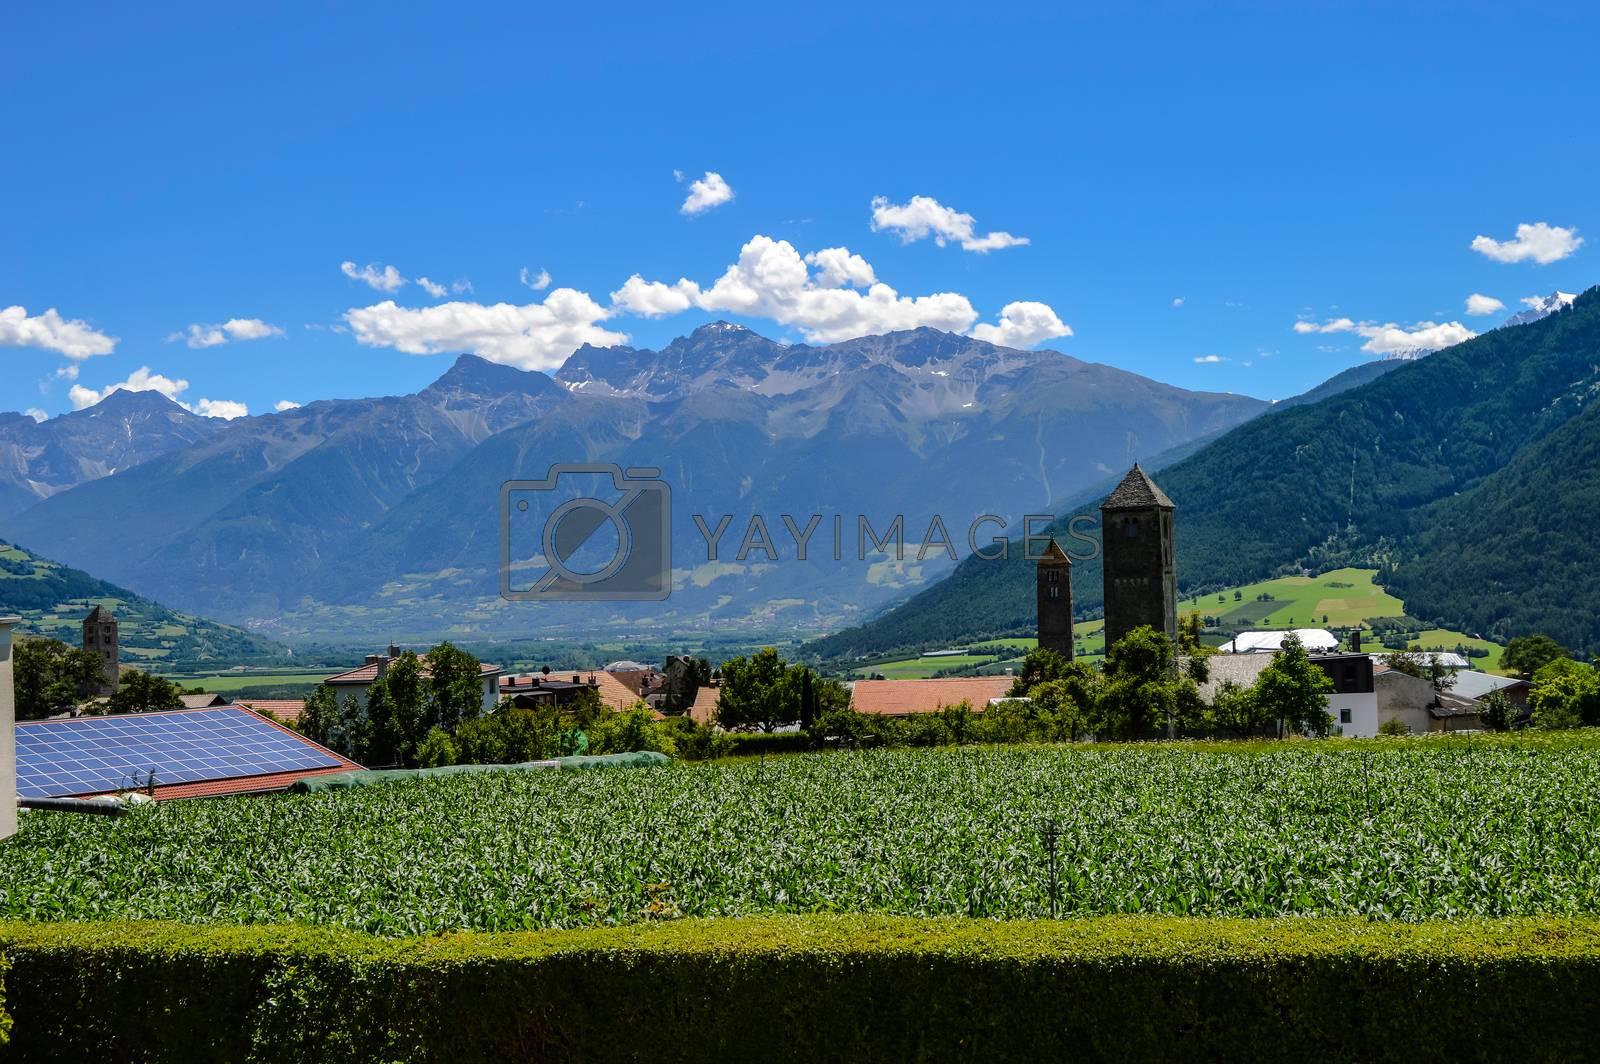 Green meadows and flowers in Valsugana - Trentino-Alto Adige Italy.